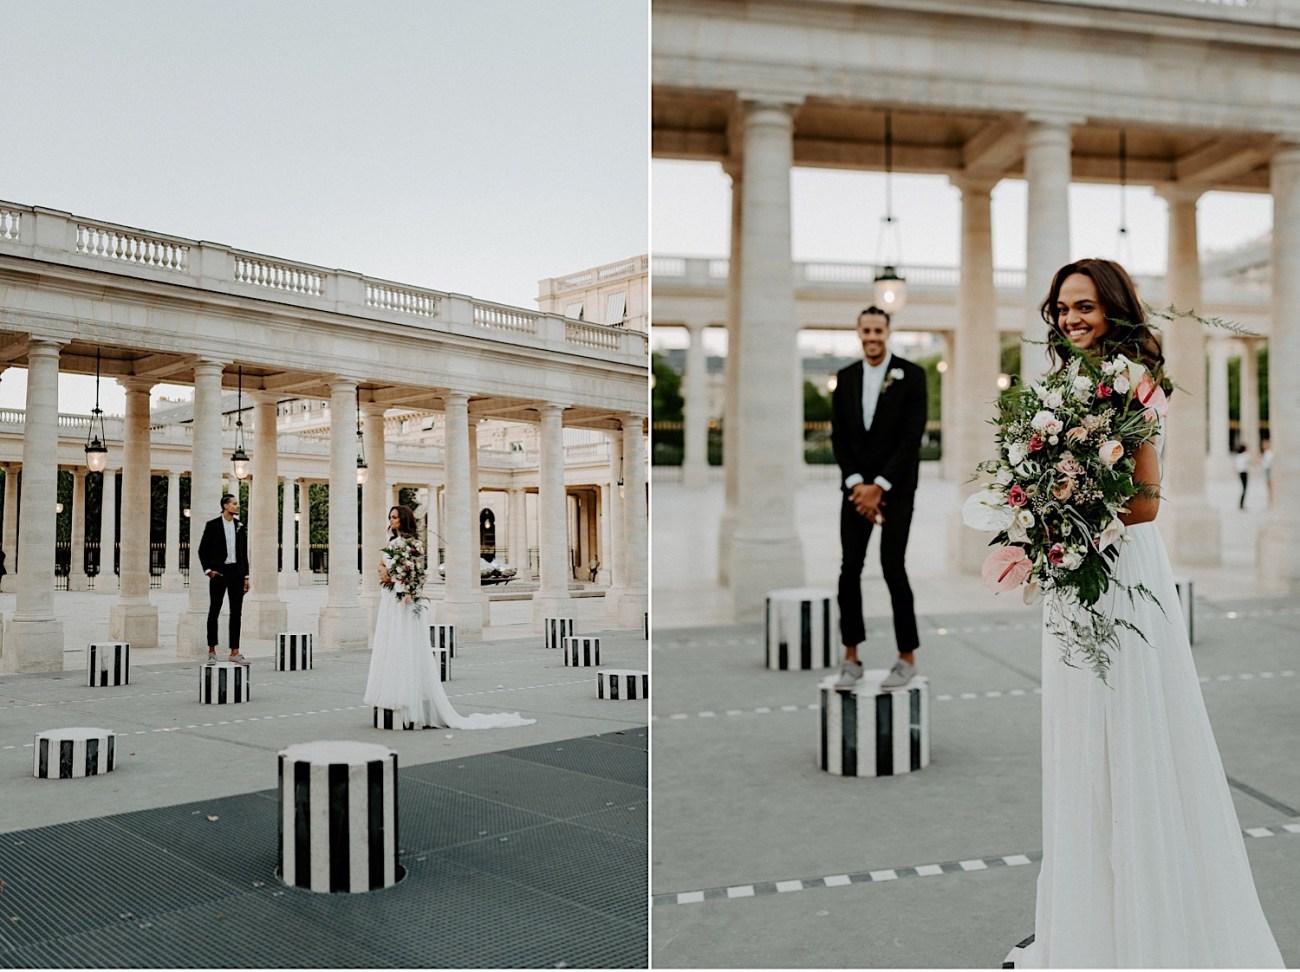 Paris Louvre Wedding Photos Paris Wedding Photographer Destination Wedding France Anais Possamai Photography 09